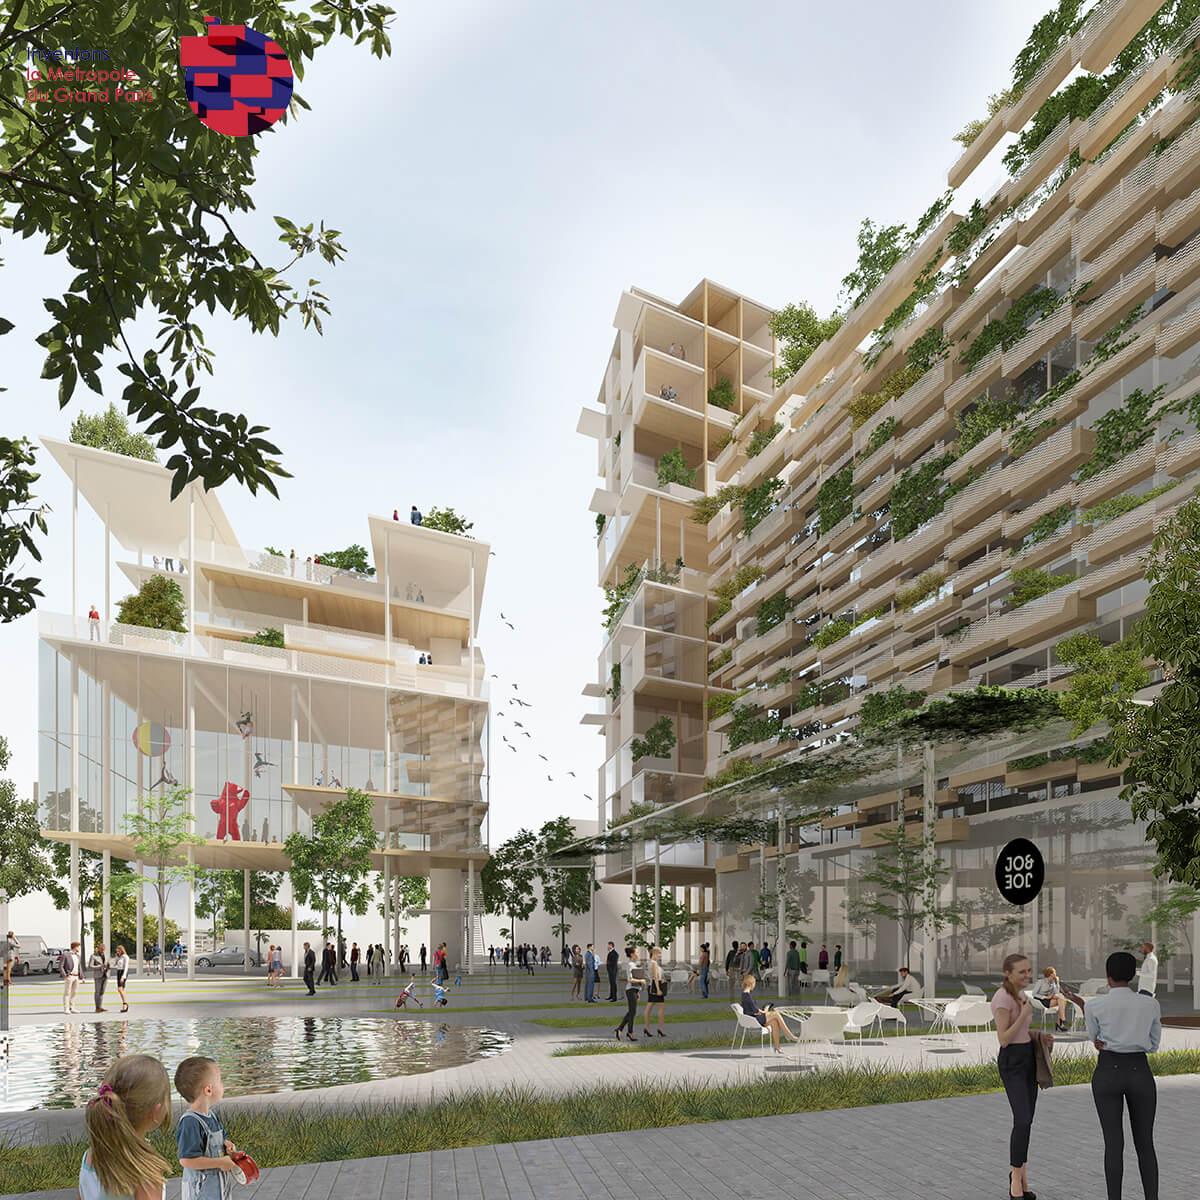 ©Les Lumières Pleyel / Sogelym - Snøhetta - Baumschlager Eberle Architekten - Ateliers 2/3/4/ - Chaix & Morel et Associés - Mars architectes - Maud Caubet Architectes - Moreau Kusunoki